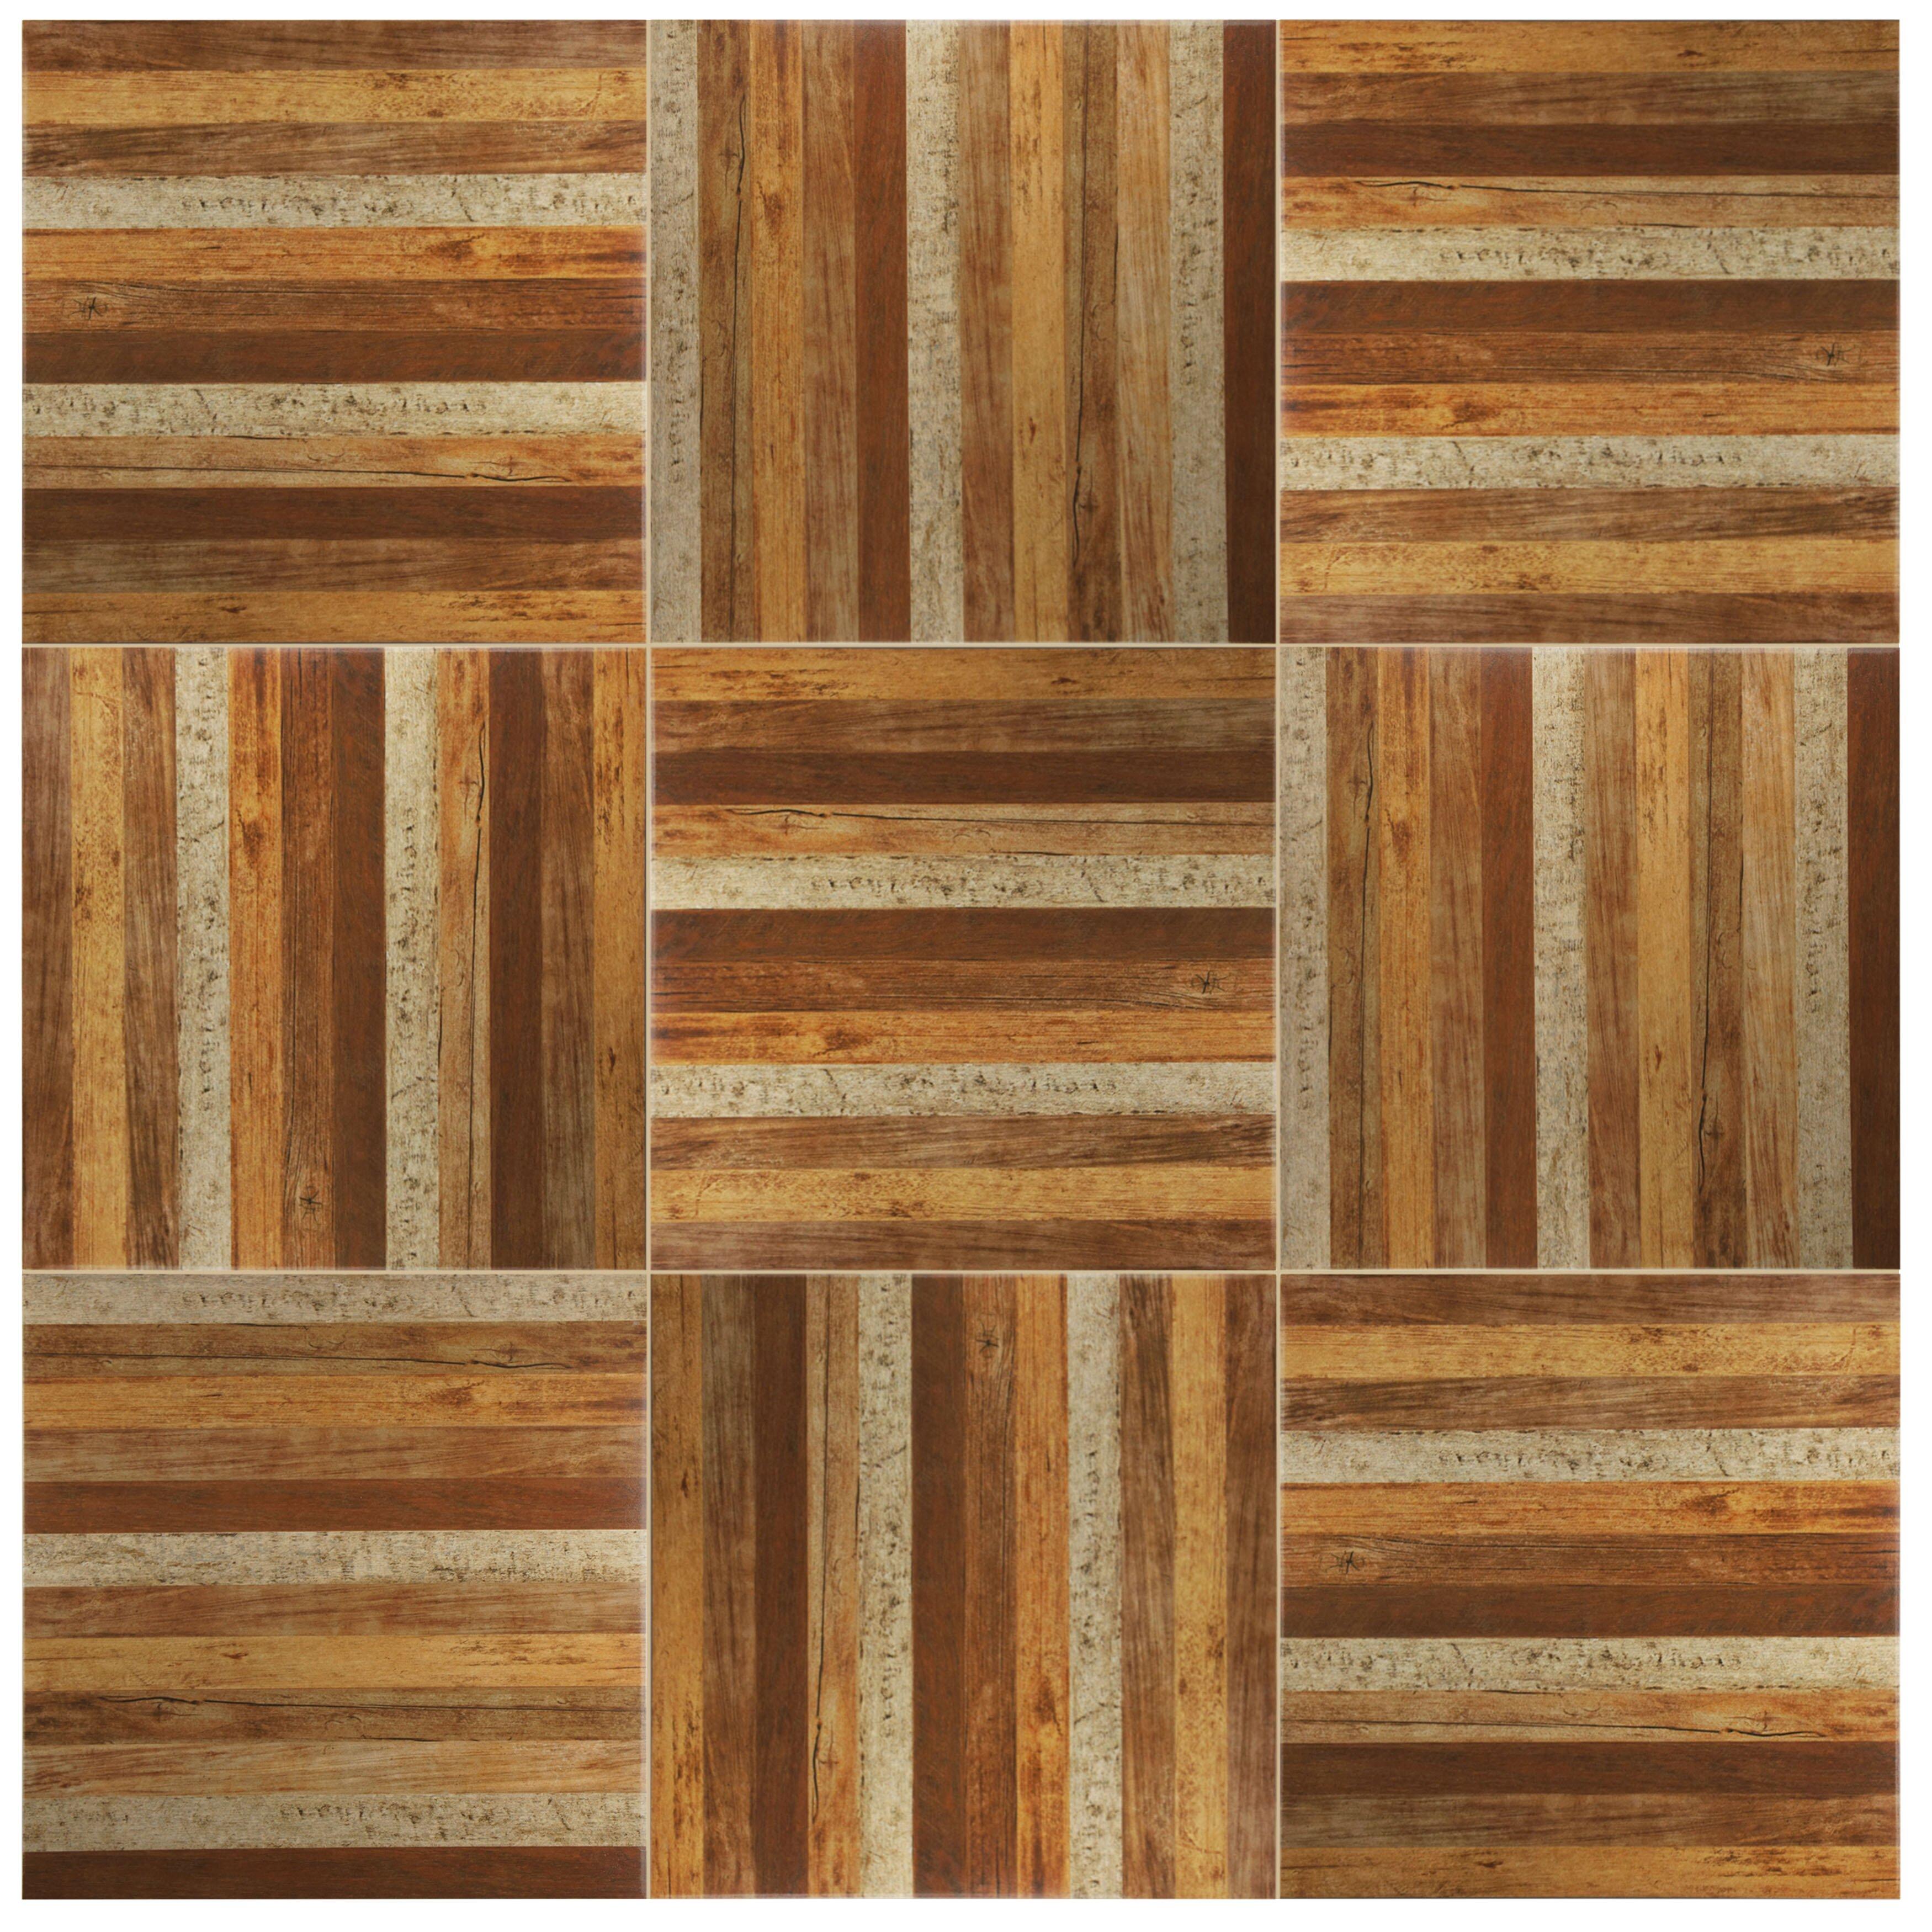 elitetile canadia x ceramic wood look tile in natural reviews wayfair. Black Bedroom Furniture Sets. Home Design Ideas